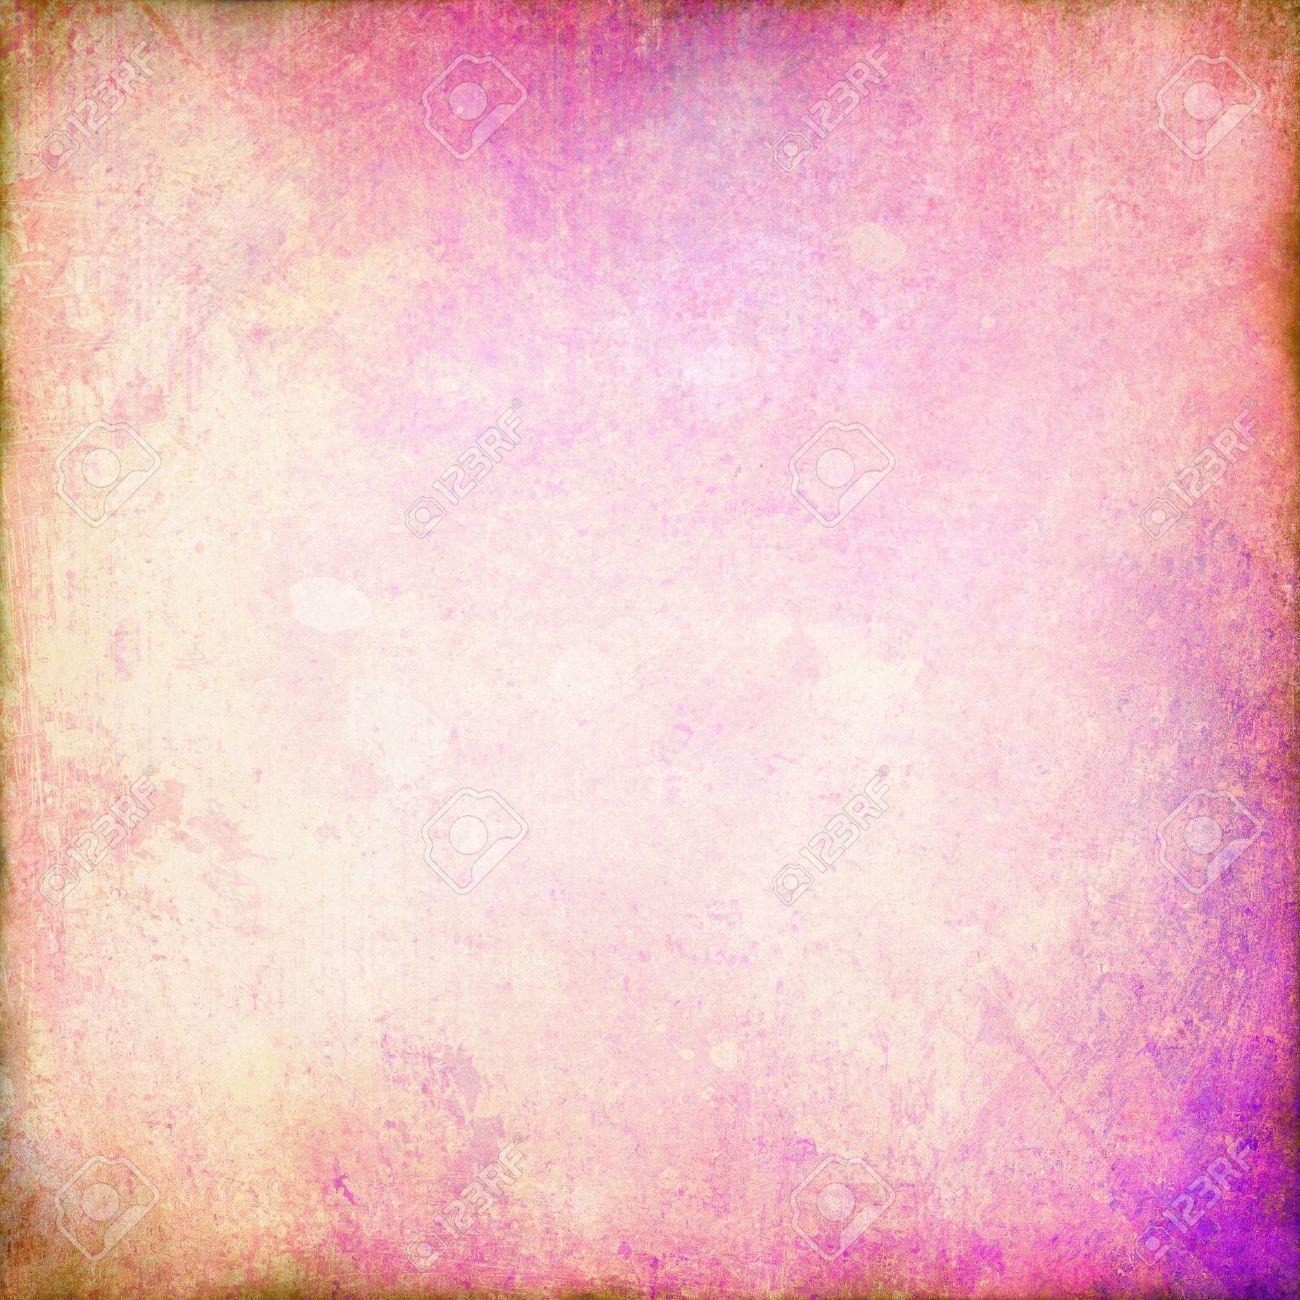 Pale Pink Background Or White Of Vintage Grunge